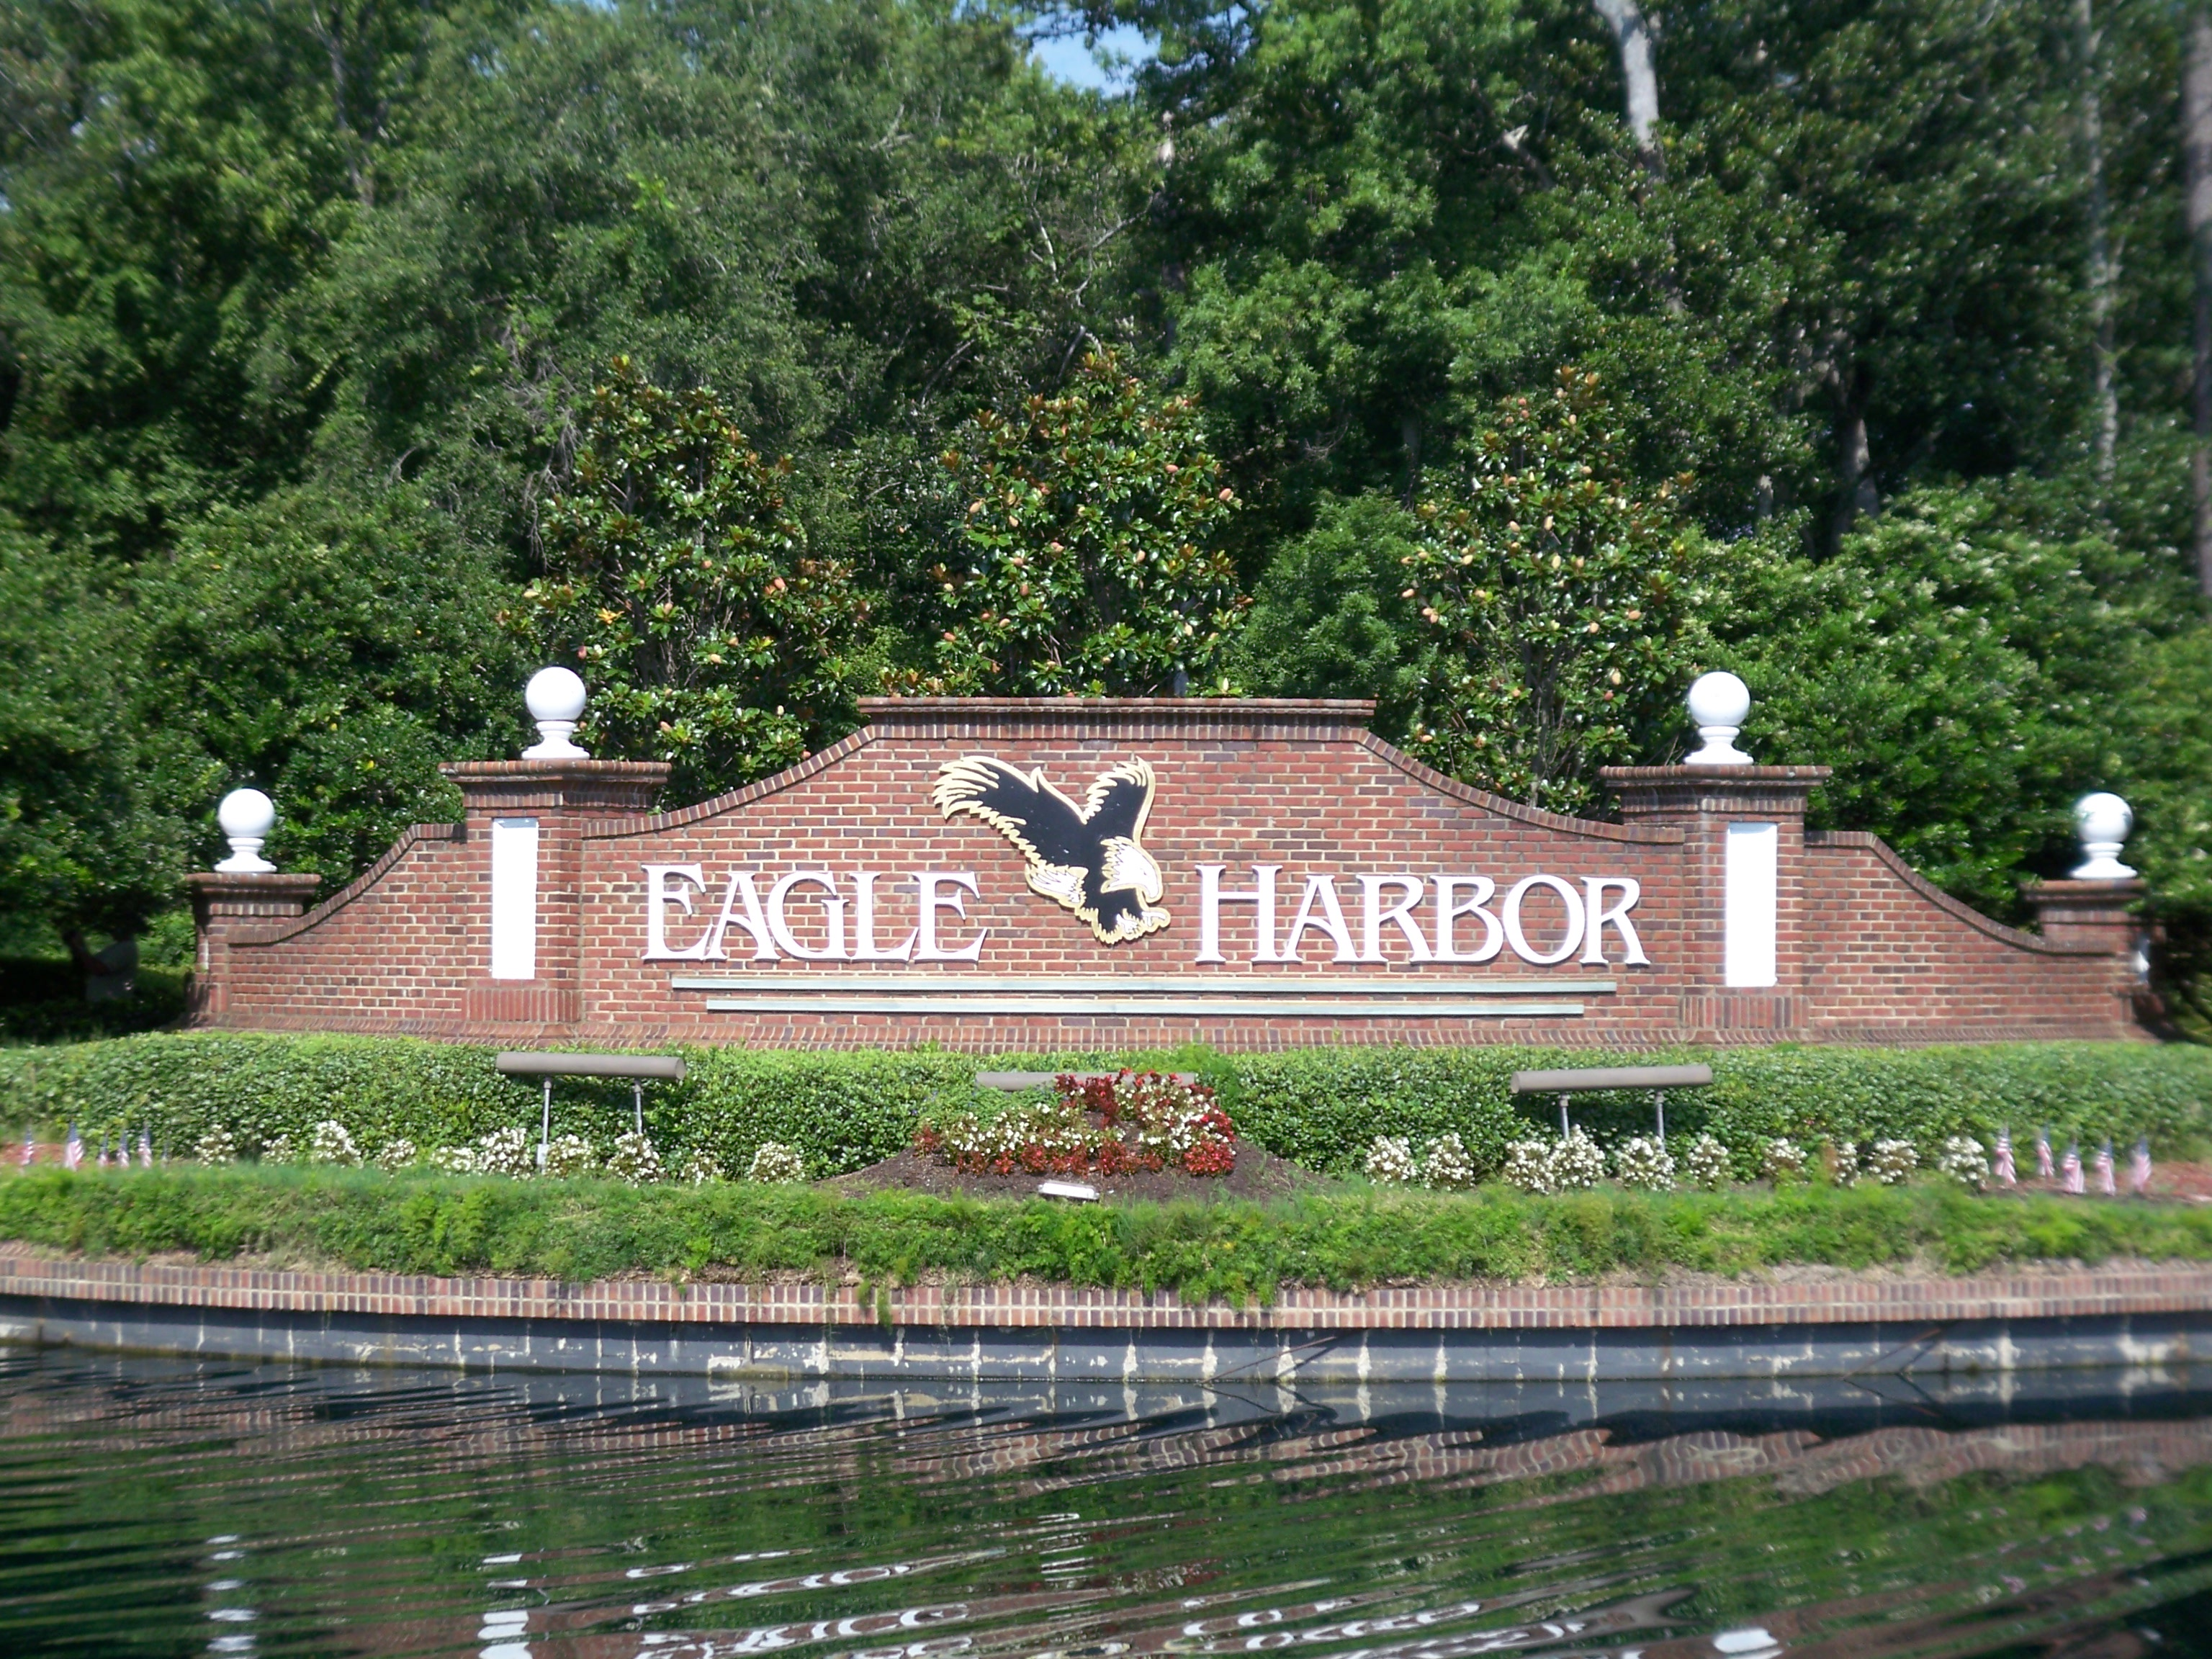 Eagle Harbor Homes for sale